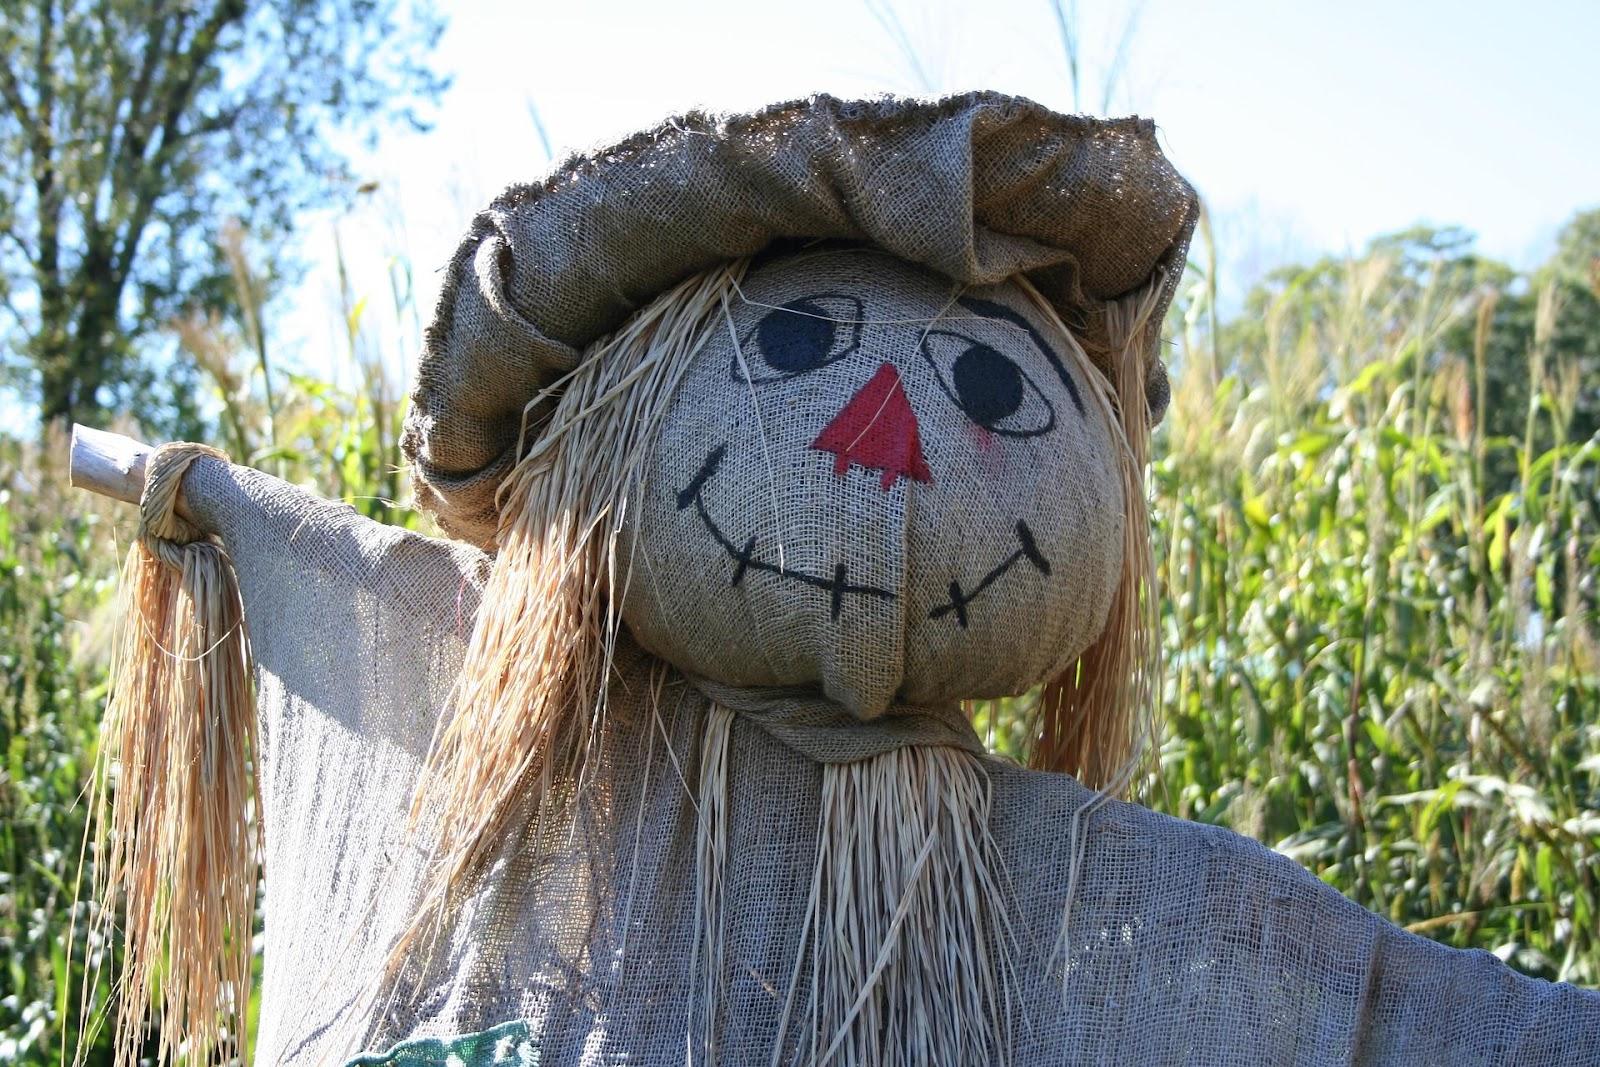 scarecrow-1714851_1920.jpg